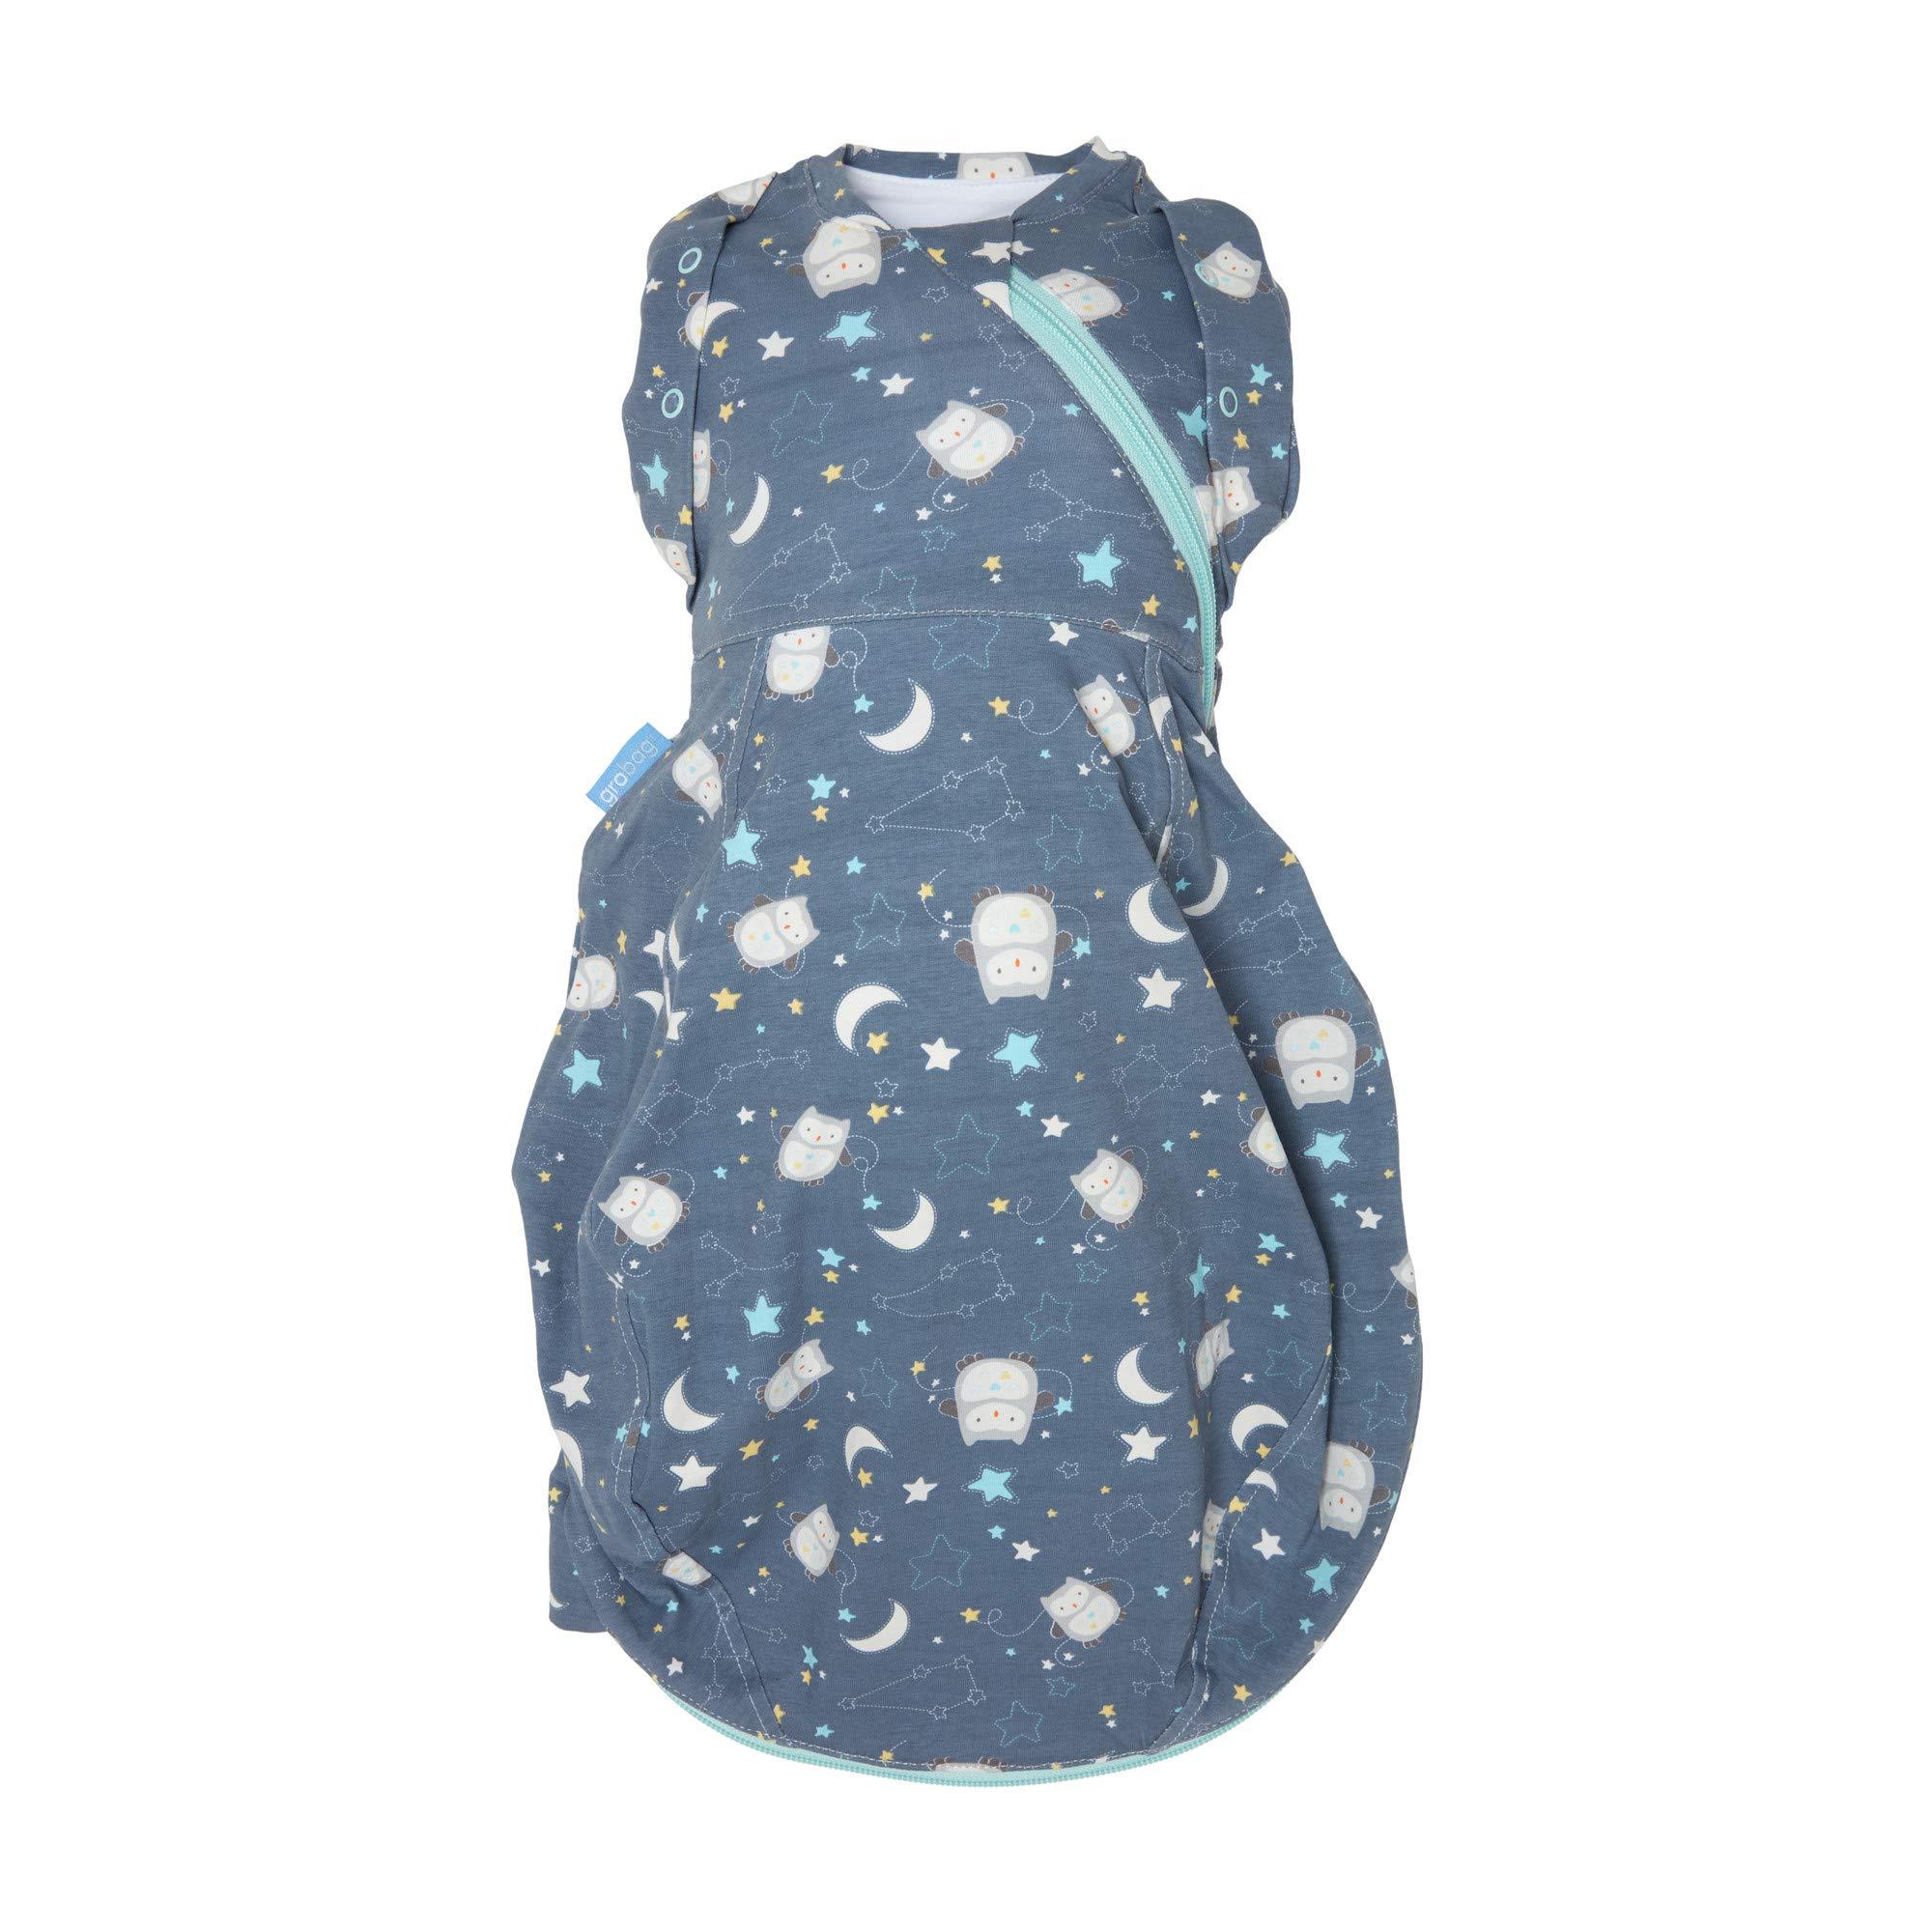 Tommee Tippee Grosnug Newborn Swaddle Sleeping Bag, Hip-Healthy Sleeping Sack - Ollie The Owl - Small Size, 0-3 Months, Blue - Warm 2.5 Tog Tog